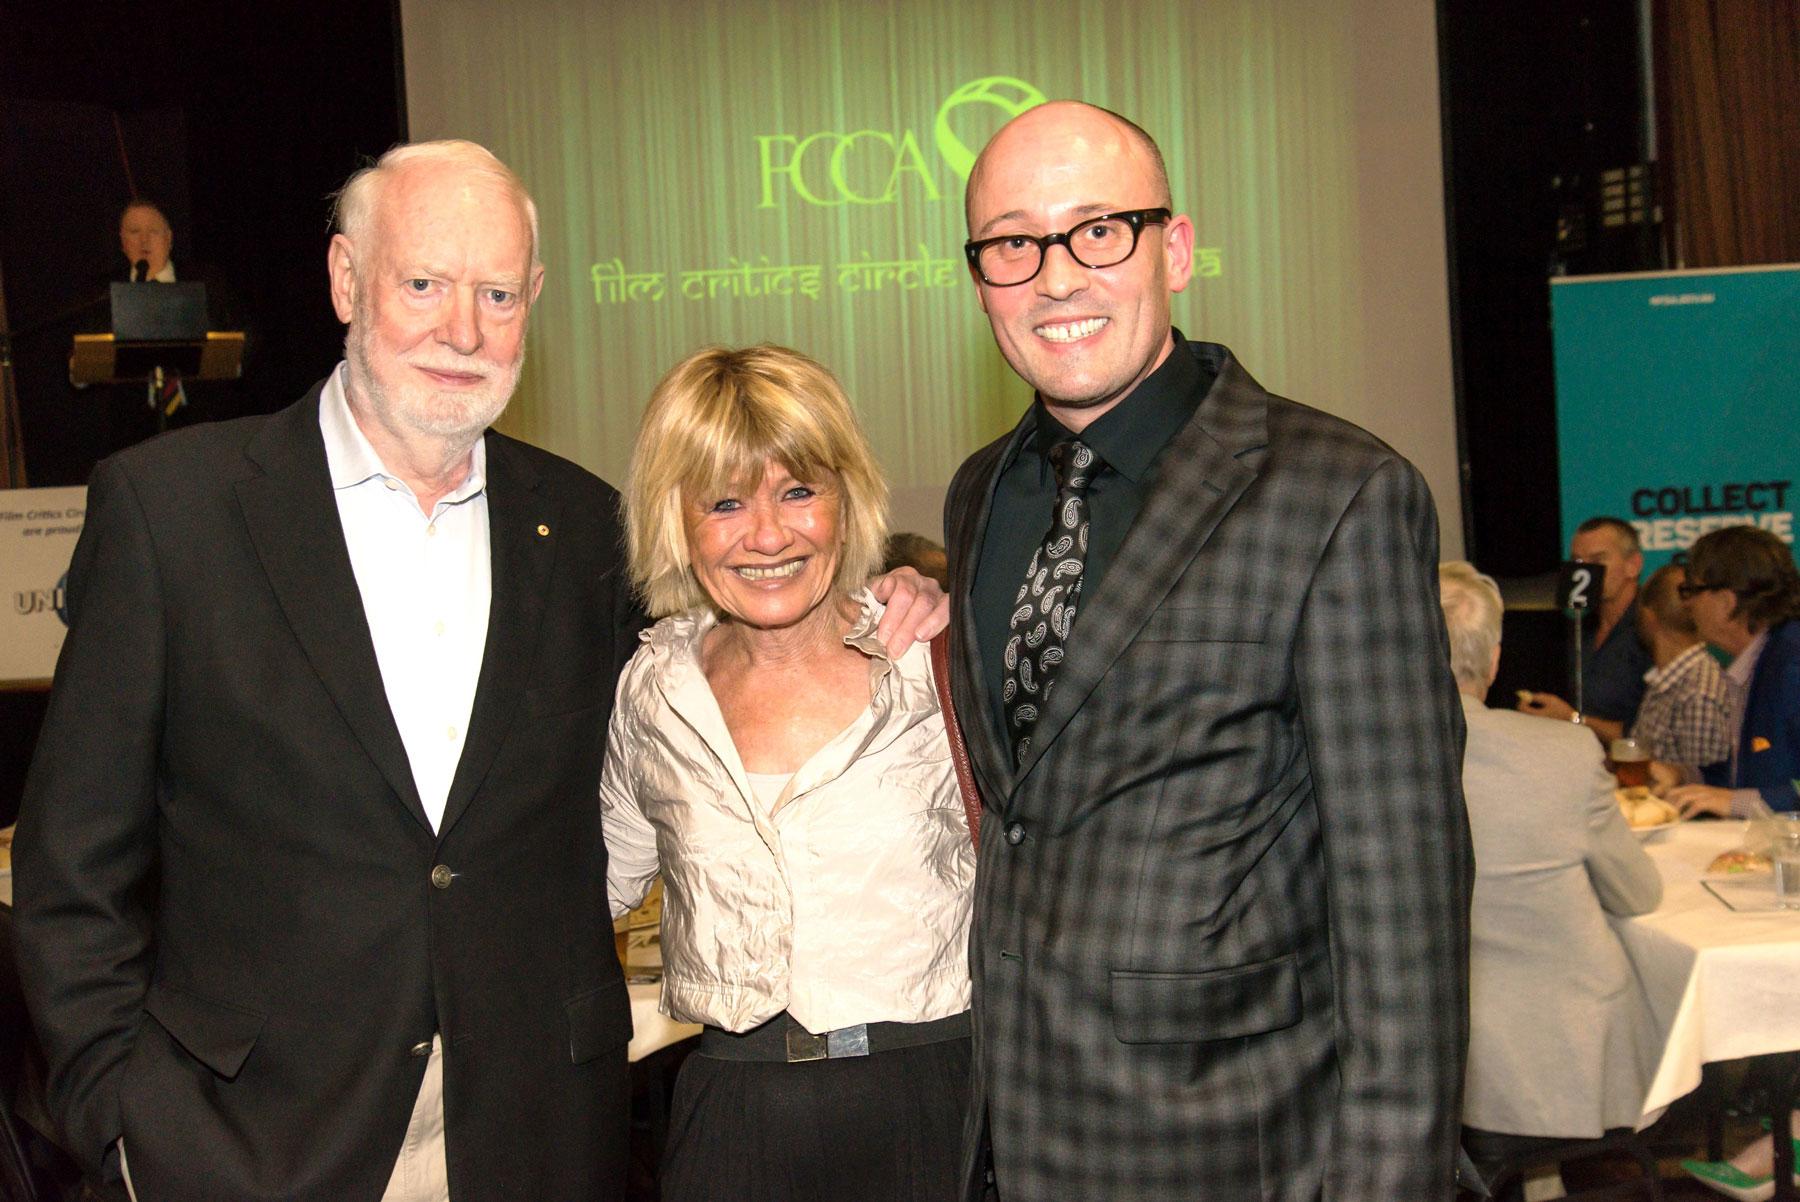 Well-known FCCA members David Stratton & Margaret Pomeranz with the FCCA Patron, Oscar-winning animator Adam Elliot.